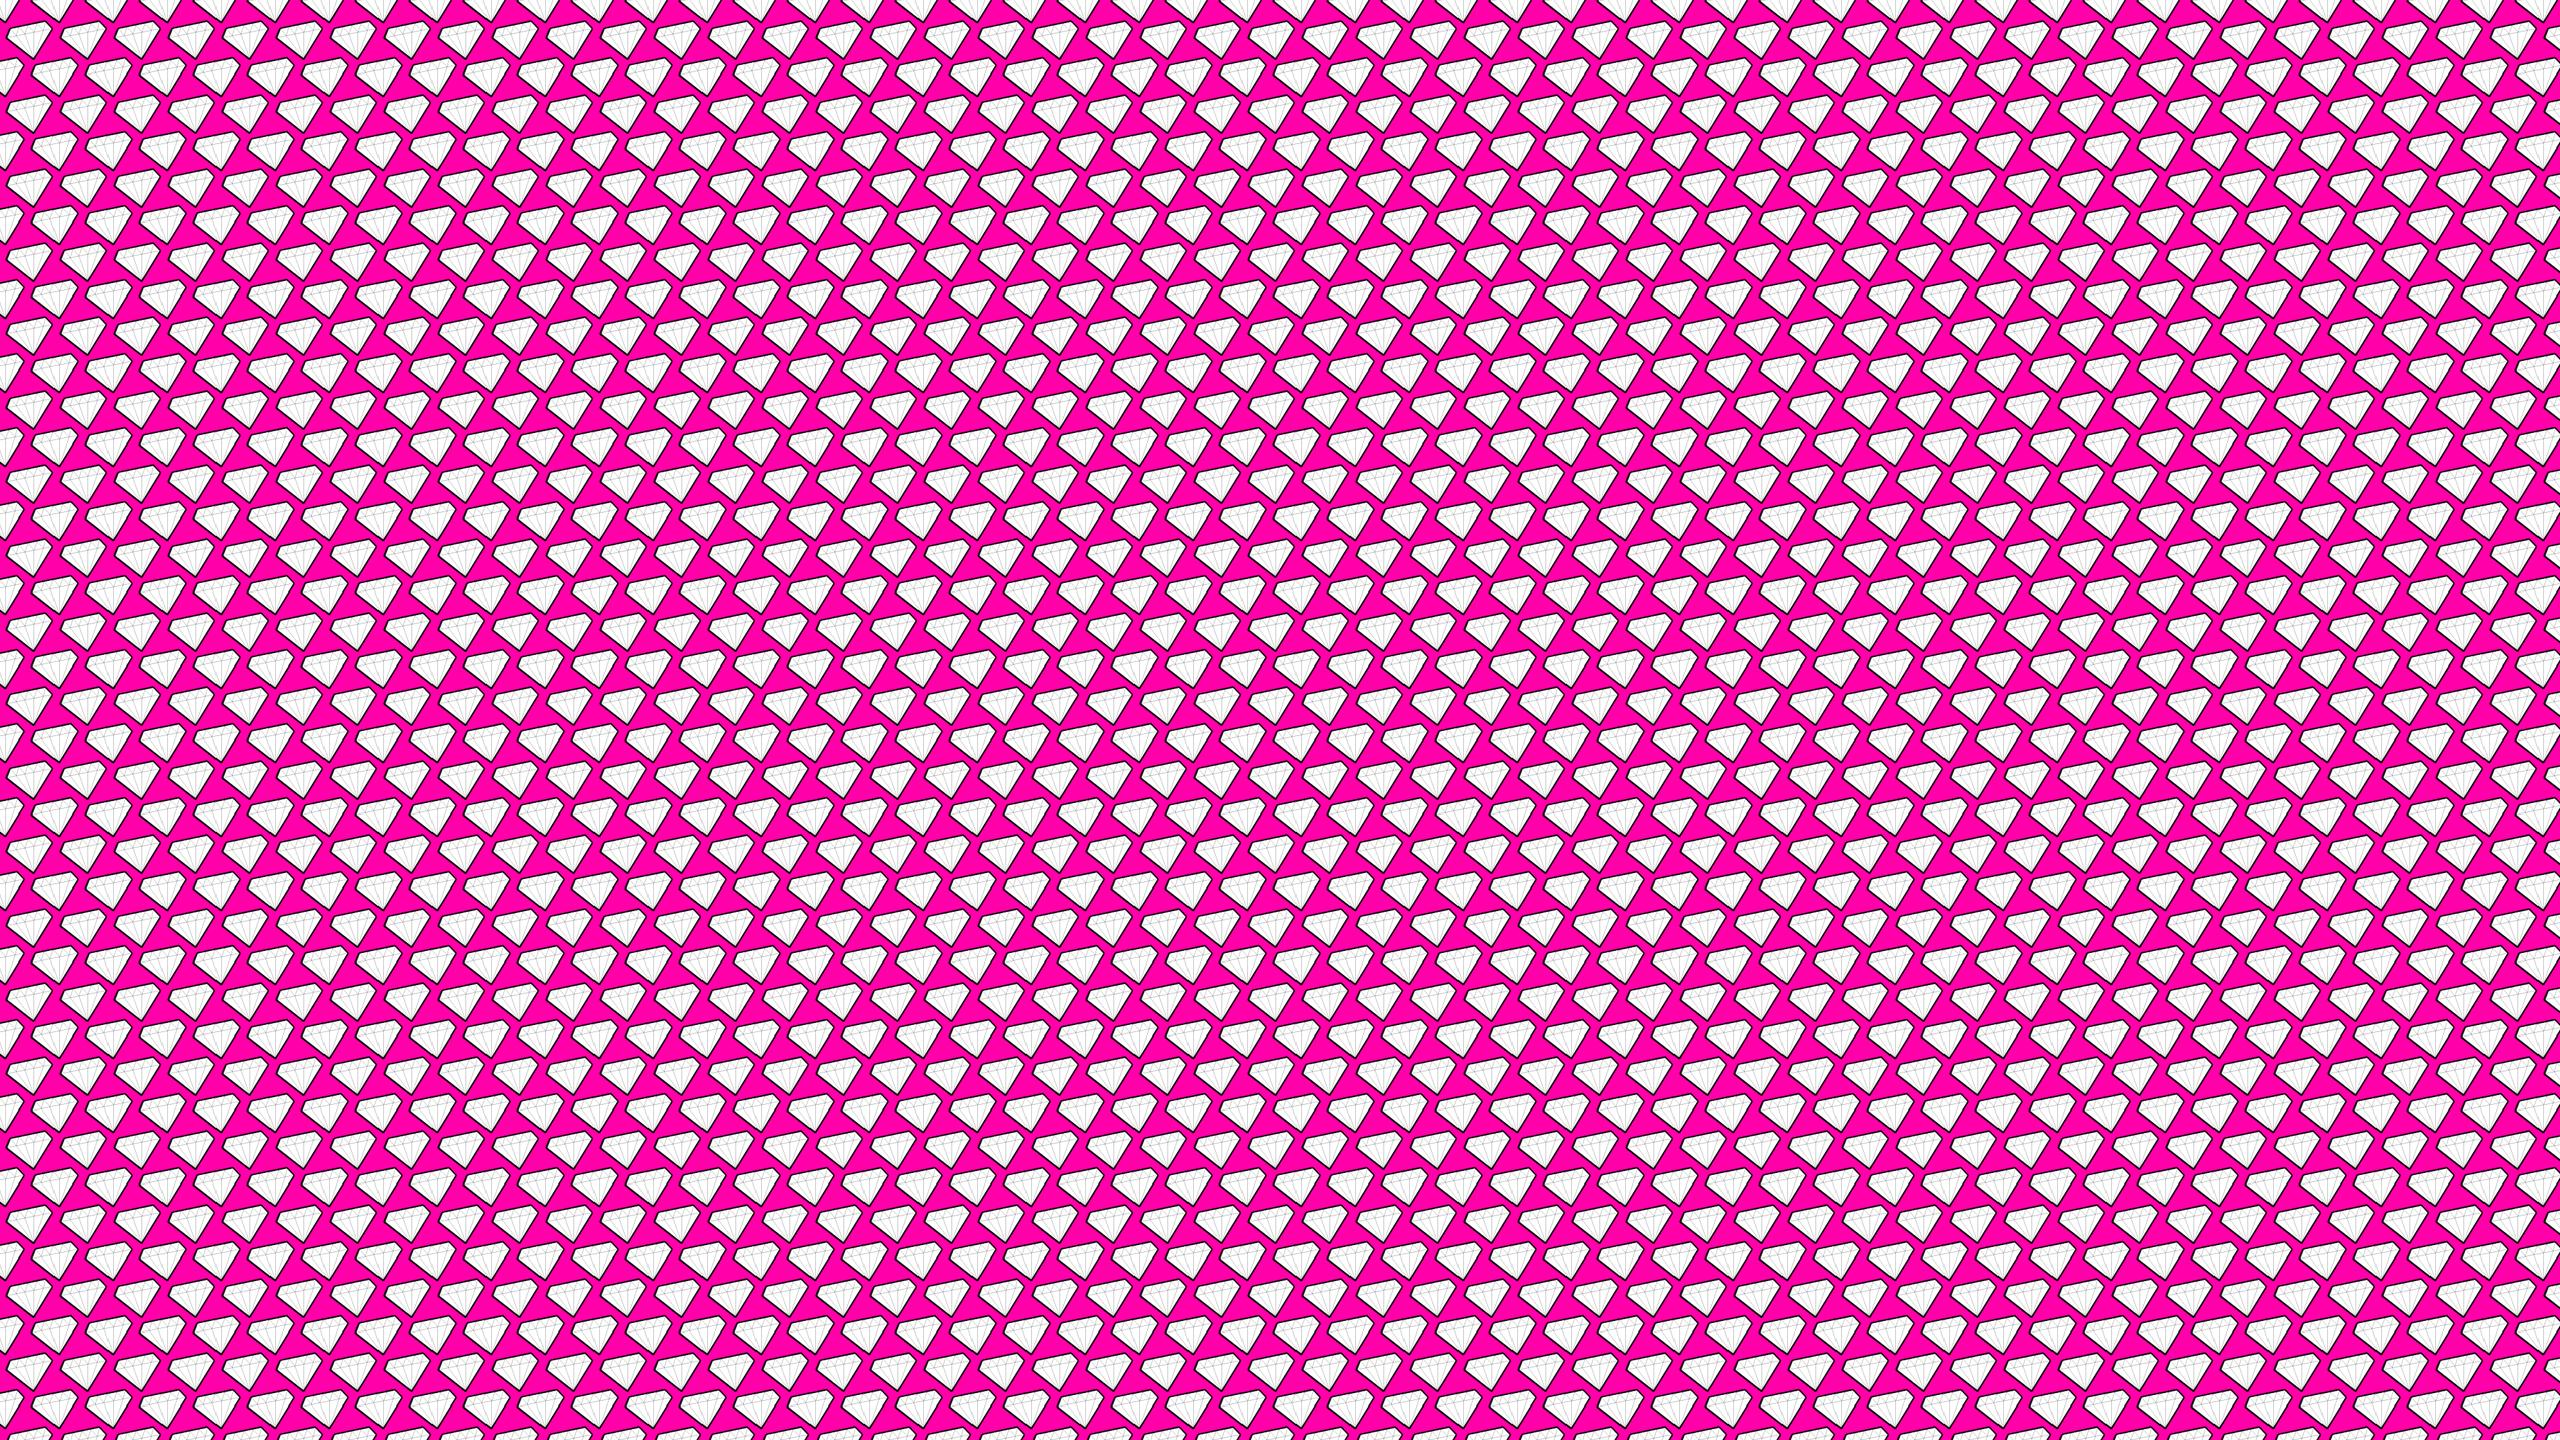 Wallpaper download girly - Download Girly Wallpaper 46944